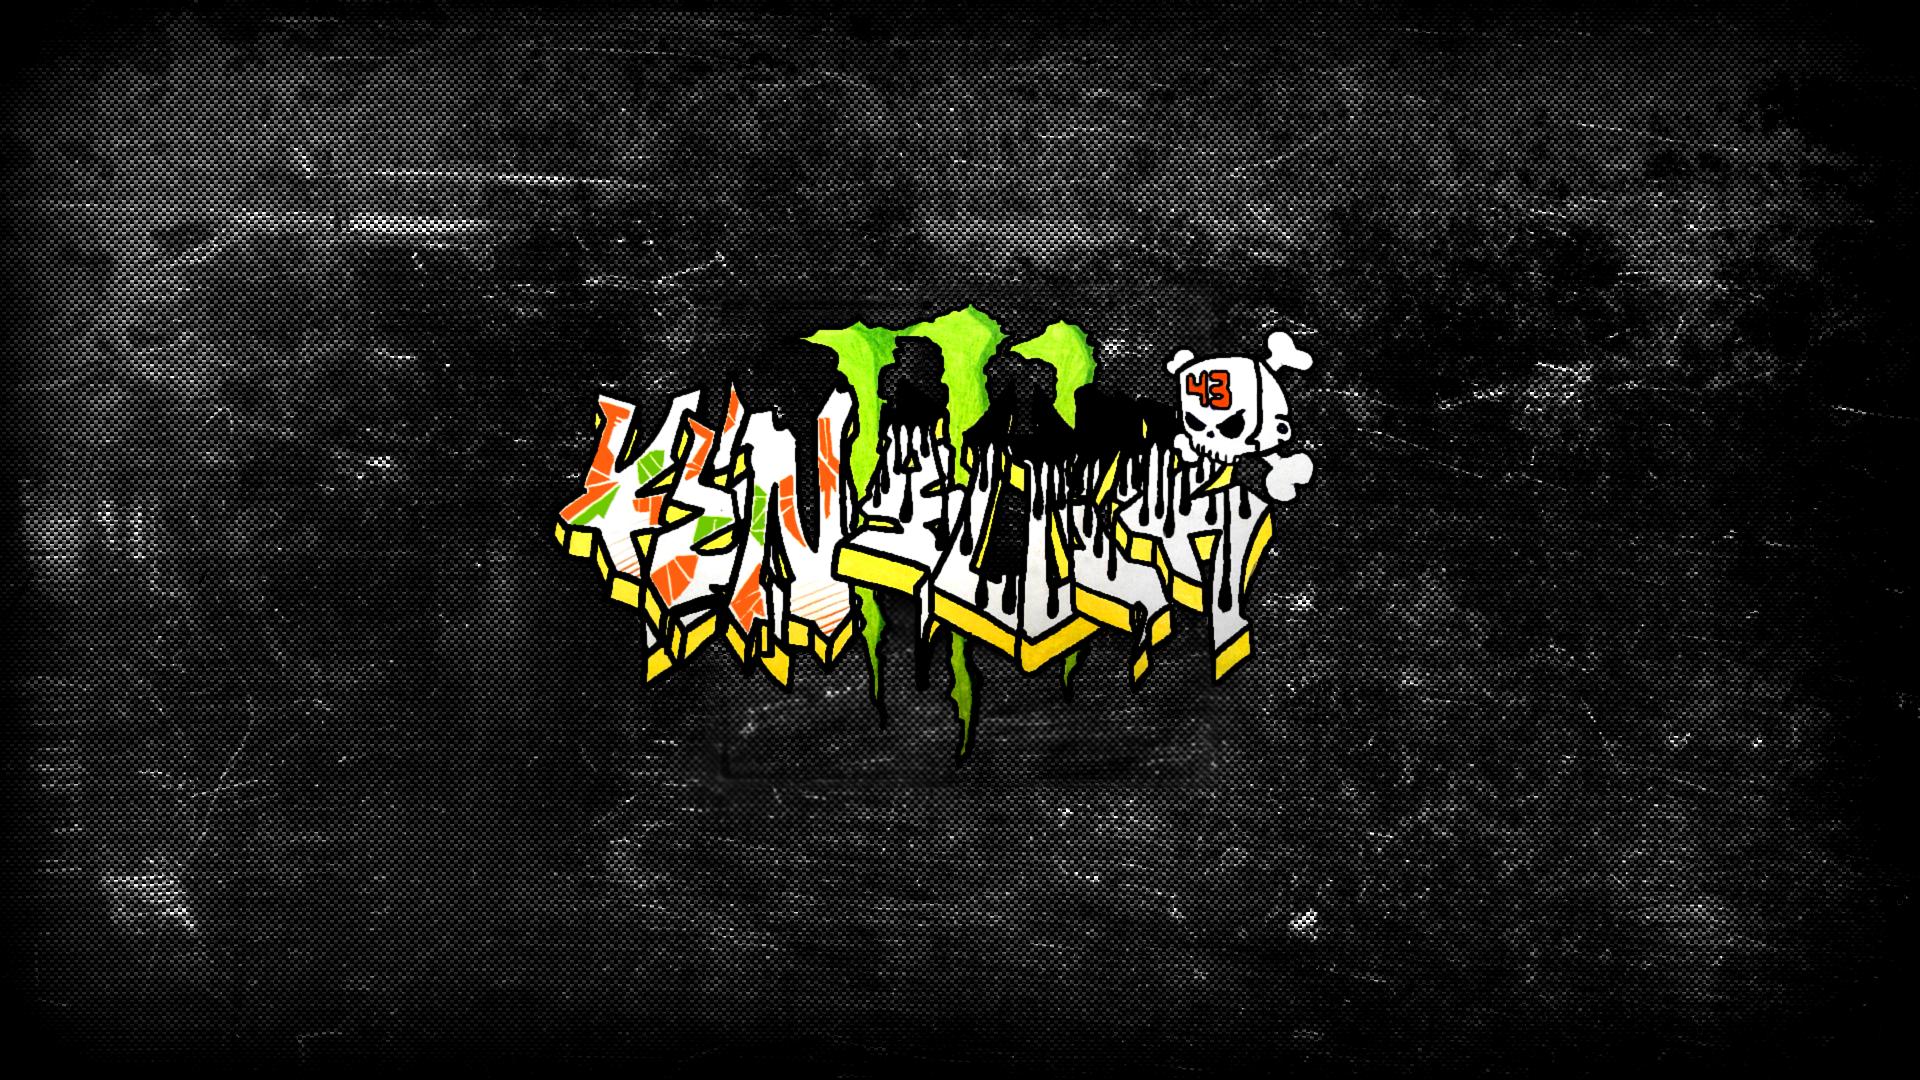 Ken Block Graffiti by NNton 1920x1080